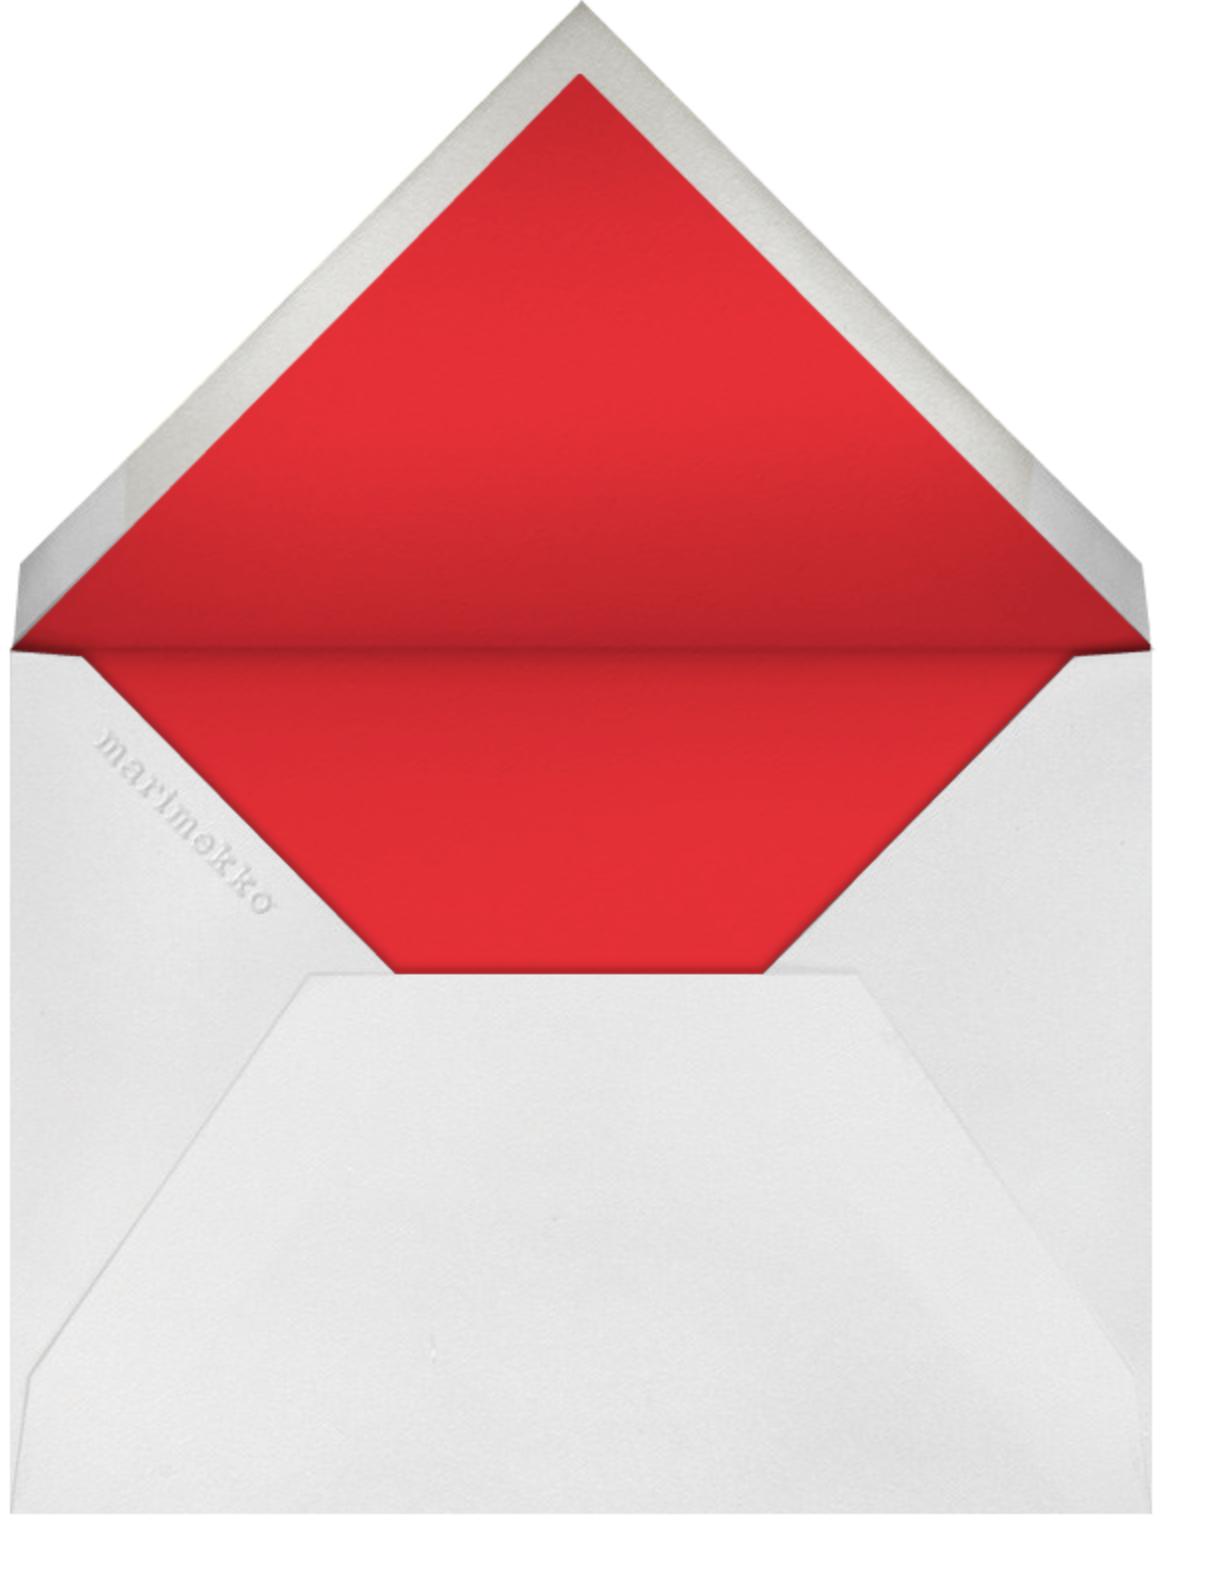 Raanu - Marimekko - Christmas party - envelope back